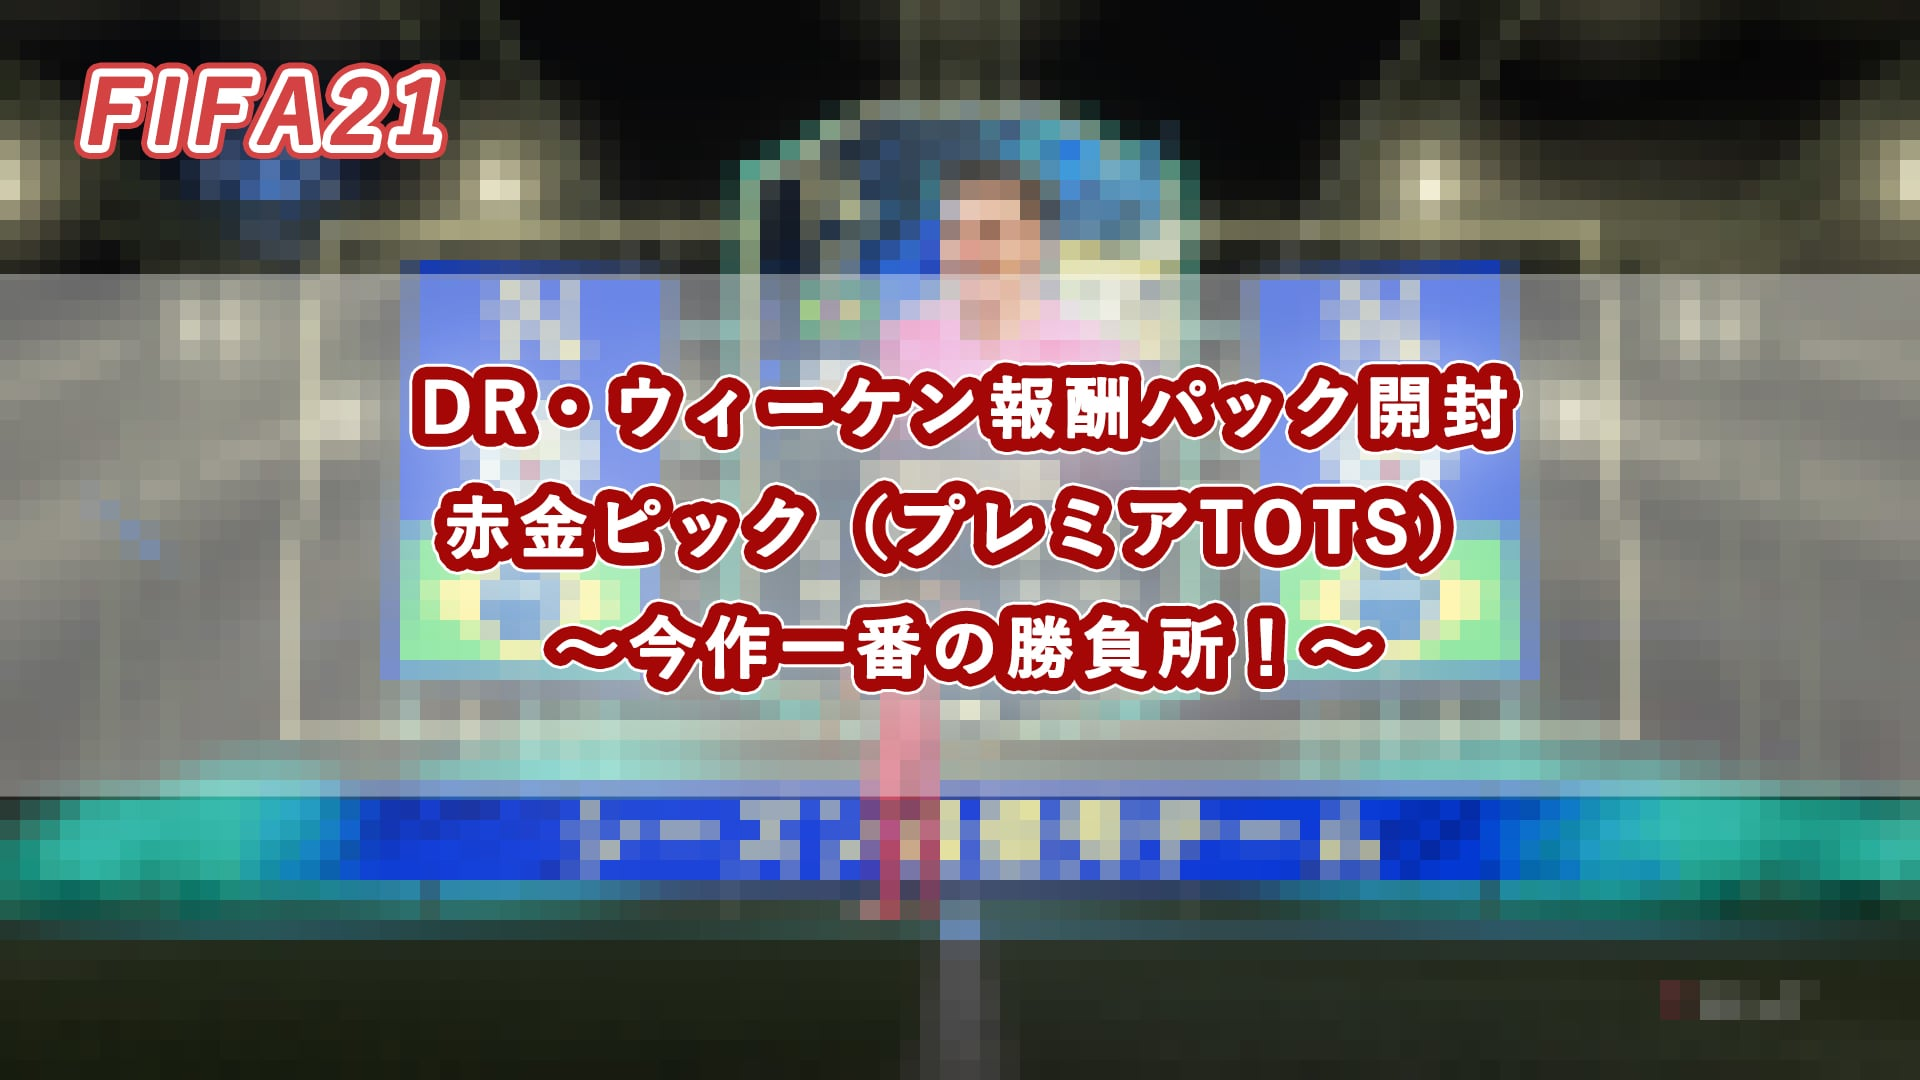 【FIFA21】DR・ウィーケン報酬パック開封&赤金ピック(プレミア) ~今作一番の勝負所!~